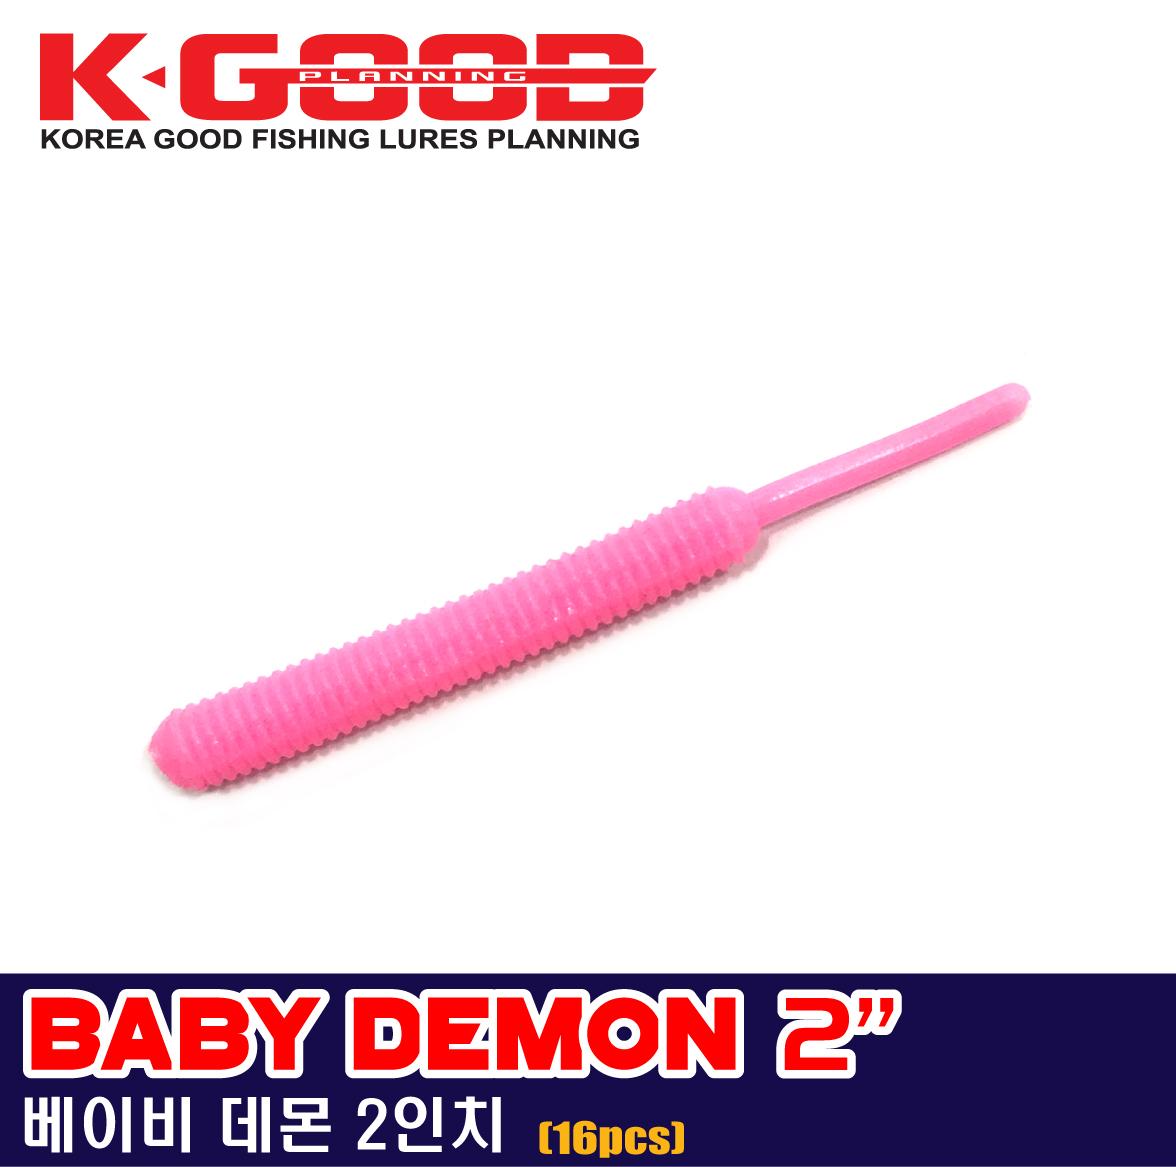 BABY DEMON 2